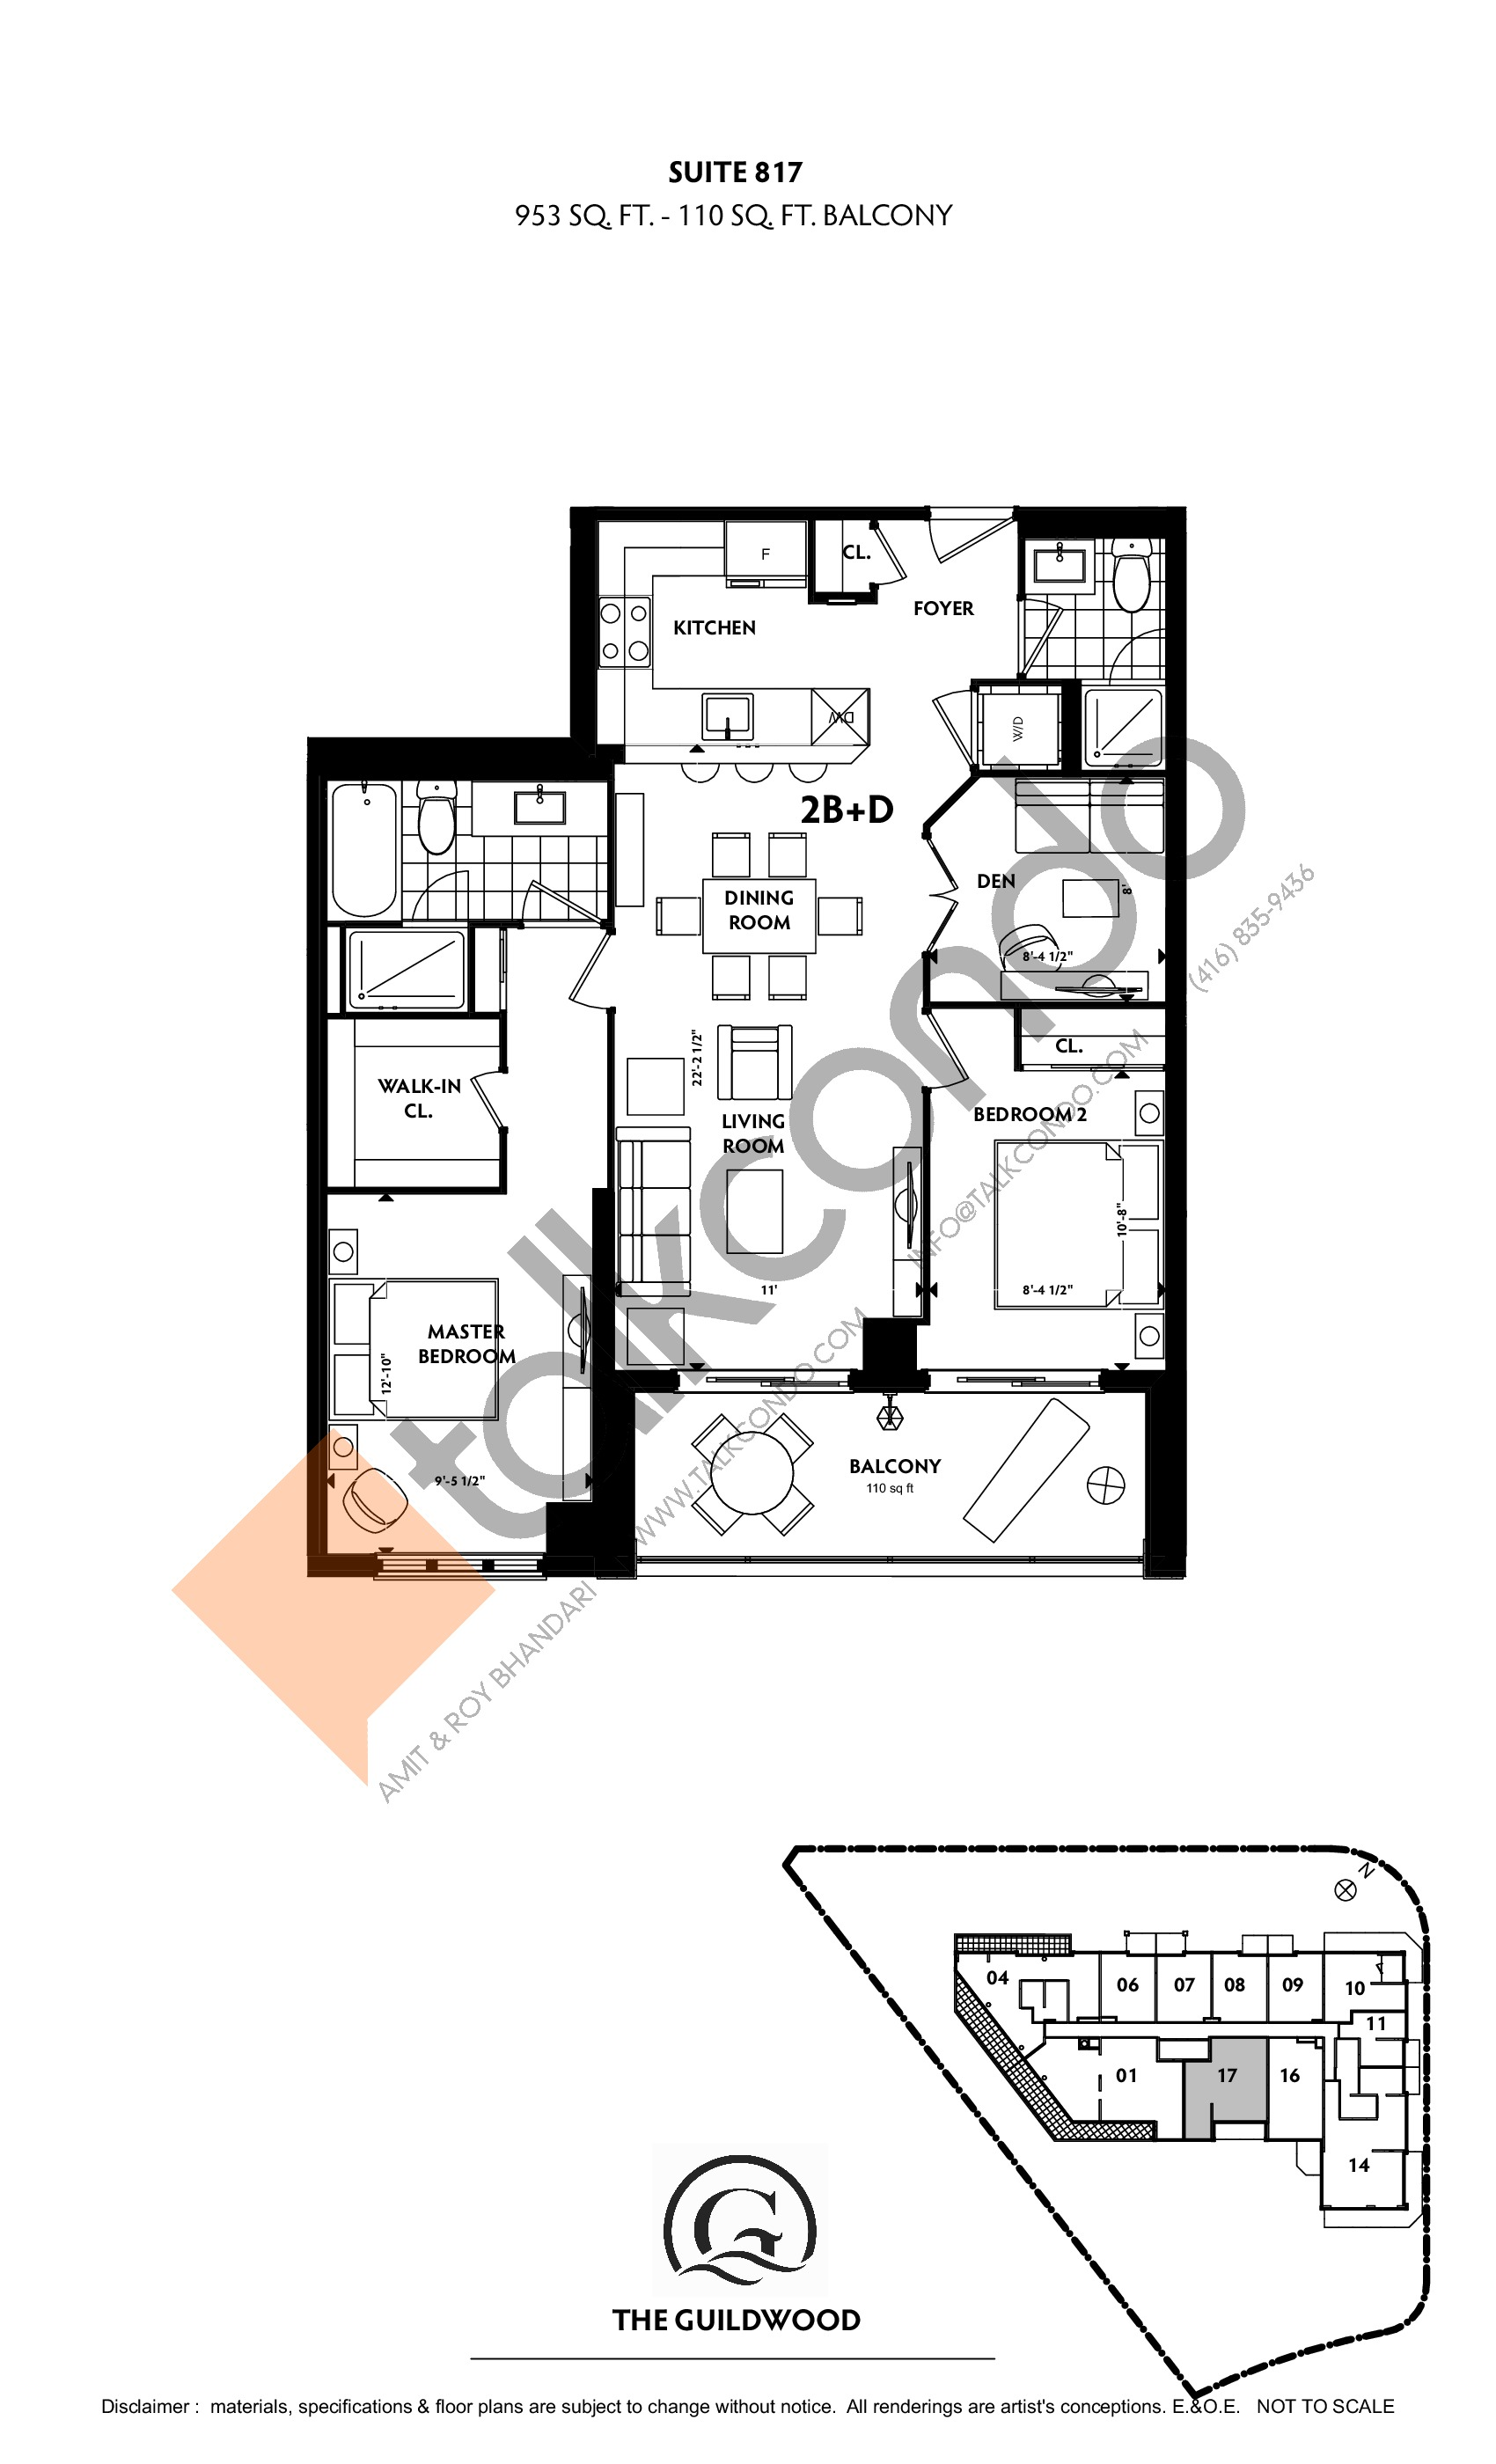 Suite 817 Floor Plan at Guildwood Condos - 953 sq.ft